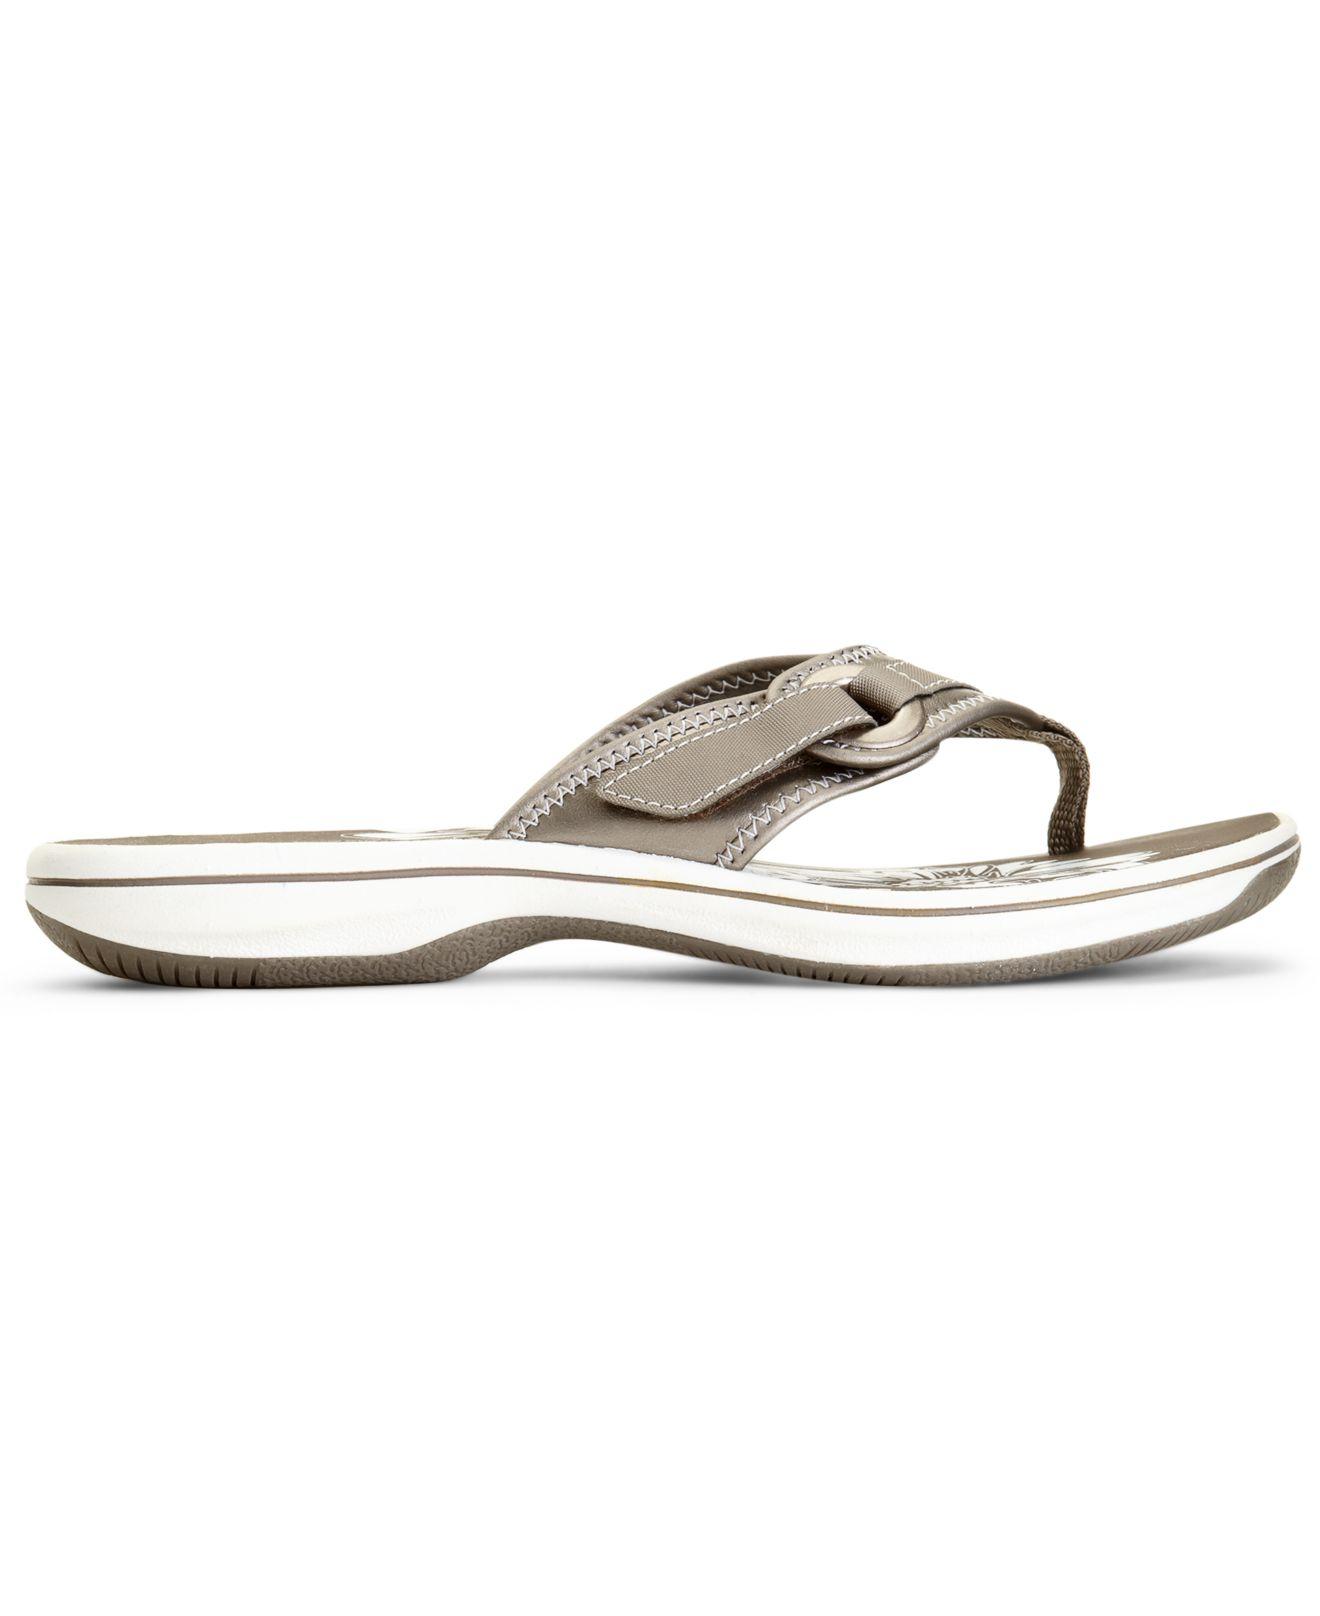 3d8d3ff5a7026a Lyst - Clarks Womens Shoes Breeze Mila Flip Flops in Gray